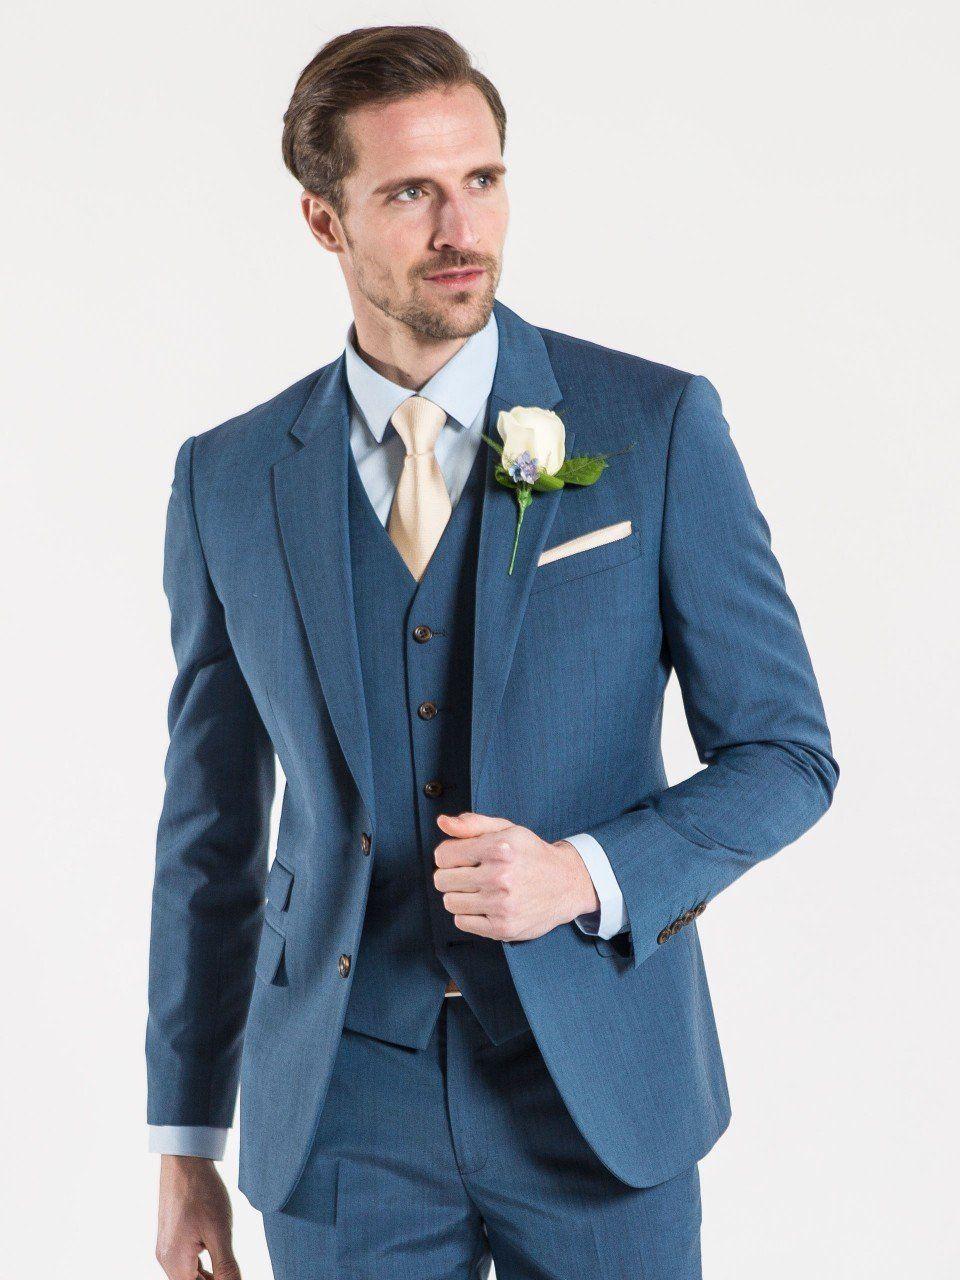 Fellini Tailored Petrol Tailored Fit Three Piece Wedding Suit ...